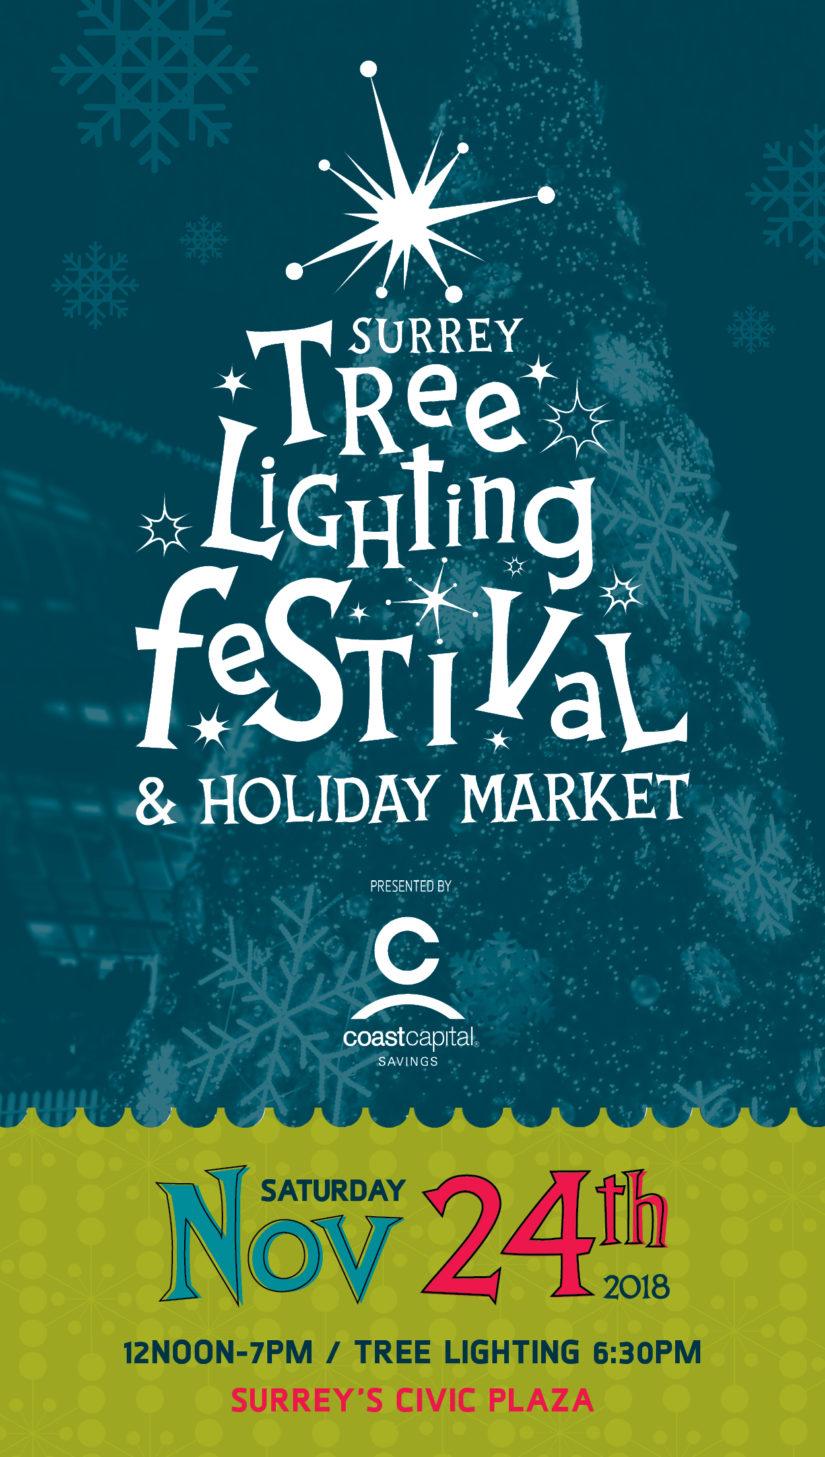 Surrey Tree Lighting Festival 2018 in Surrey